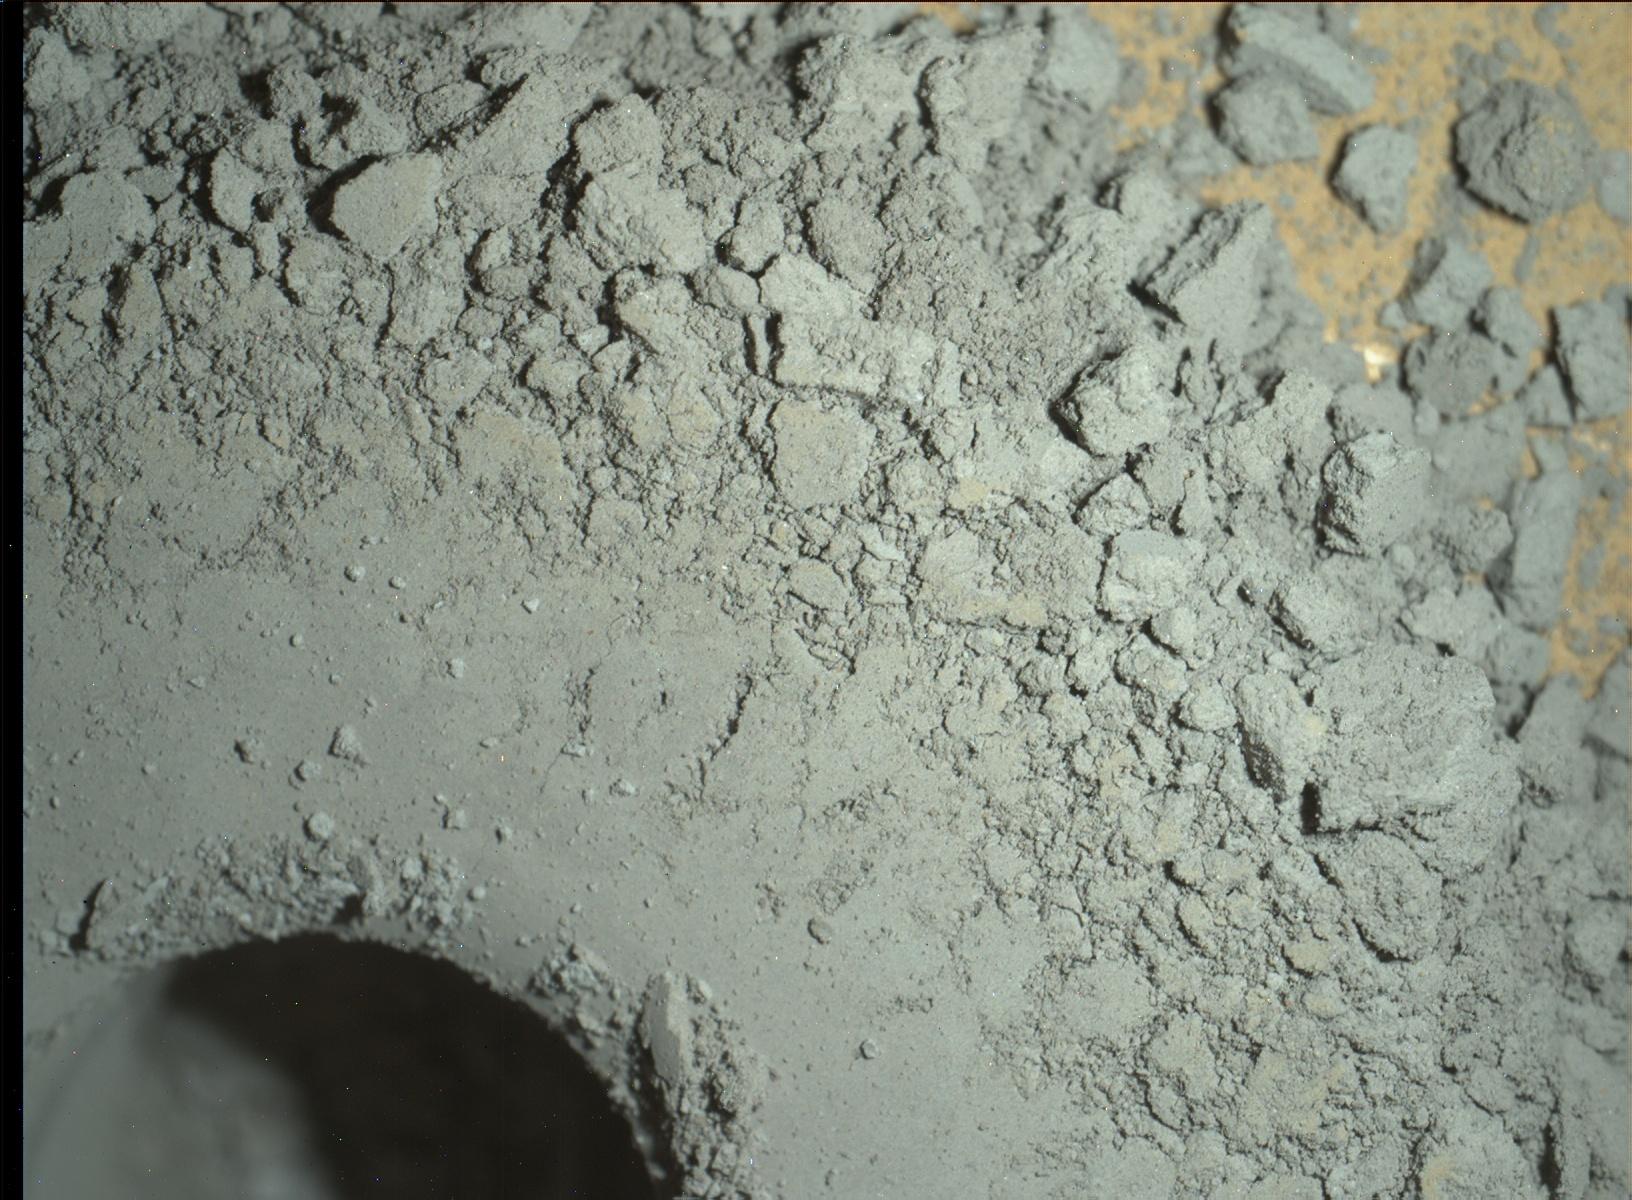 Sol 1364 MAHLI Oudam hole